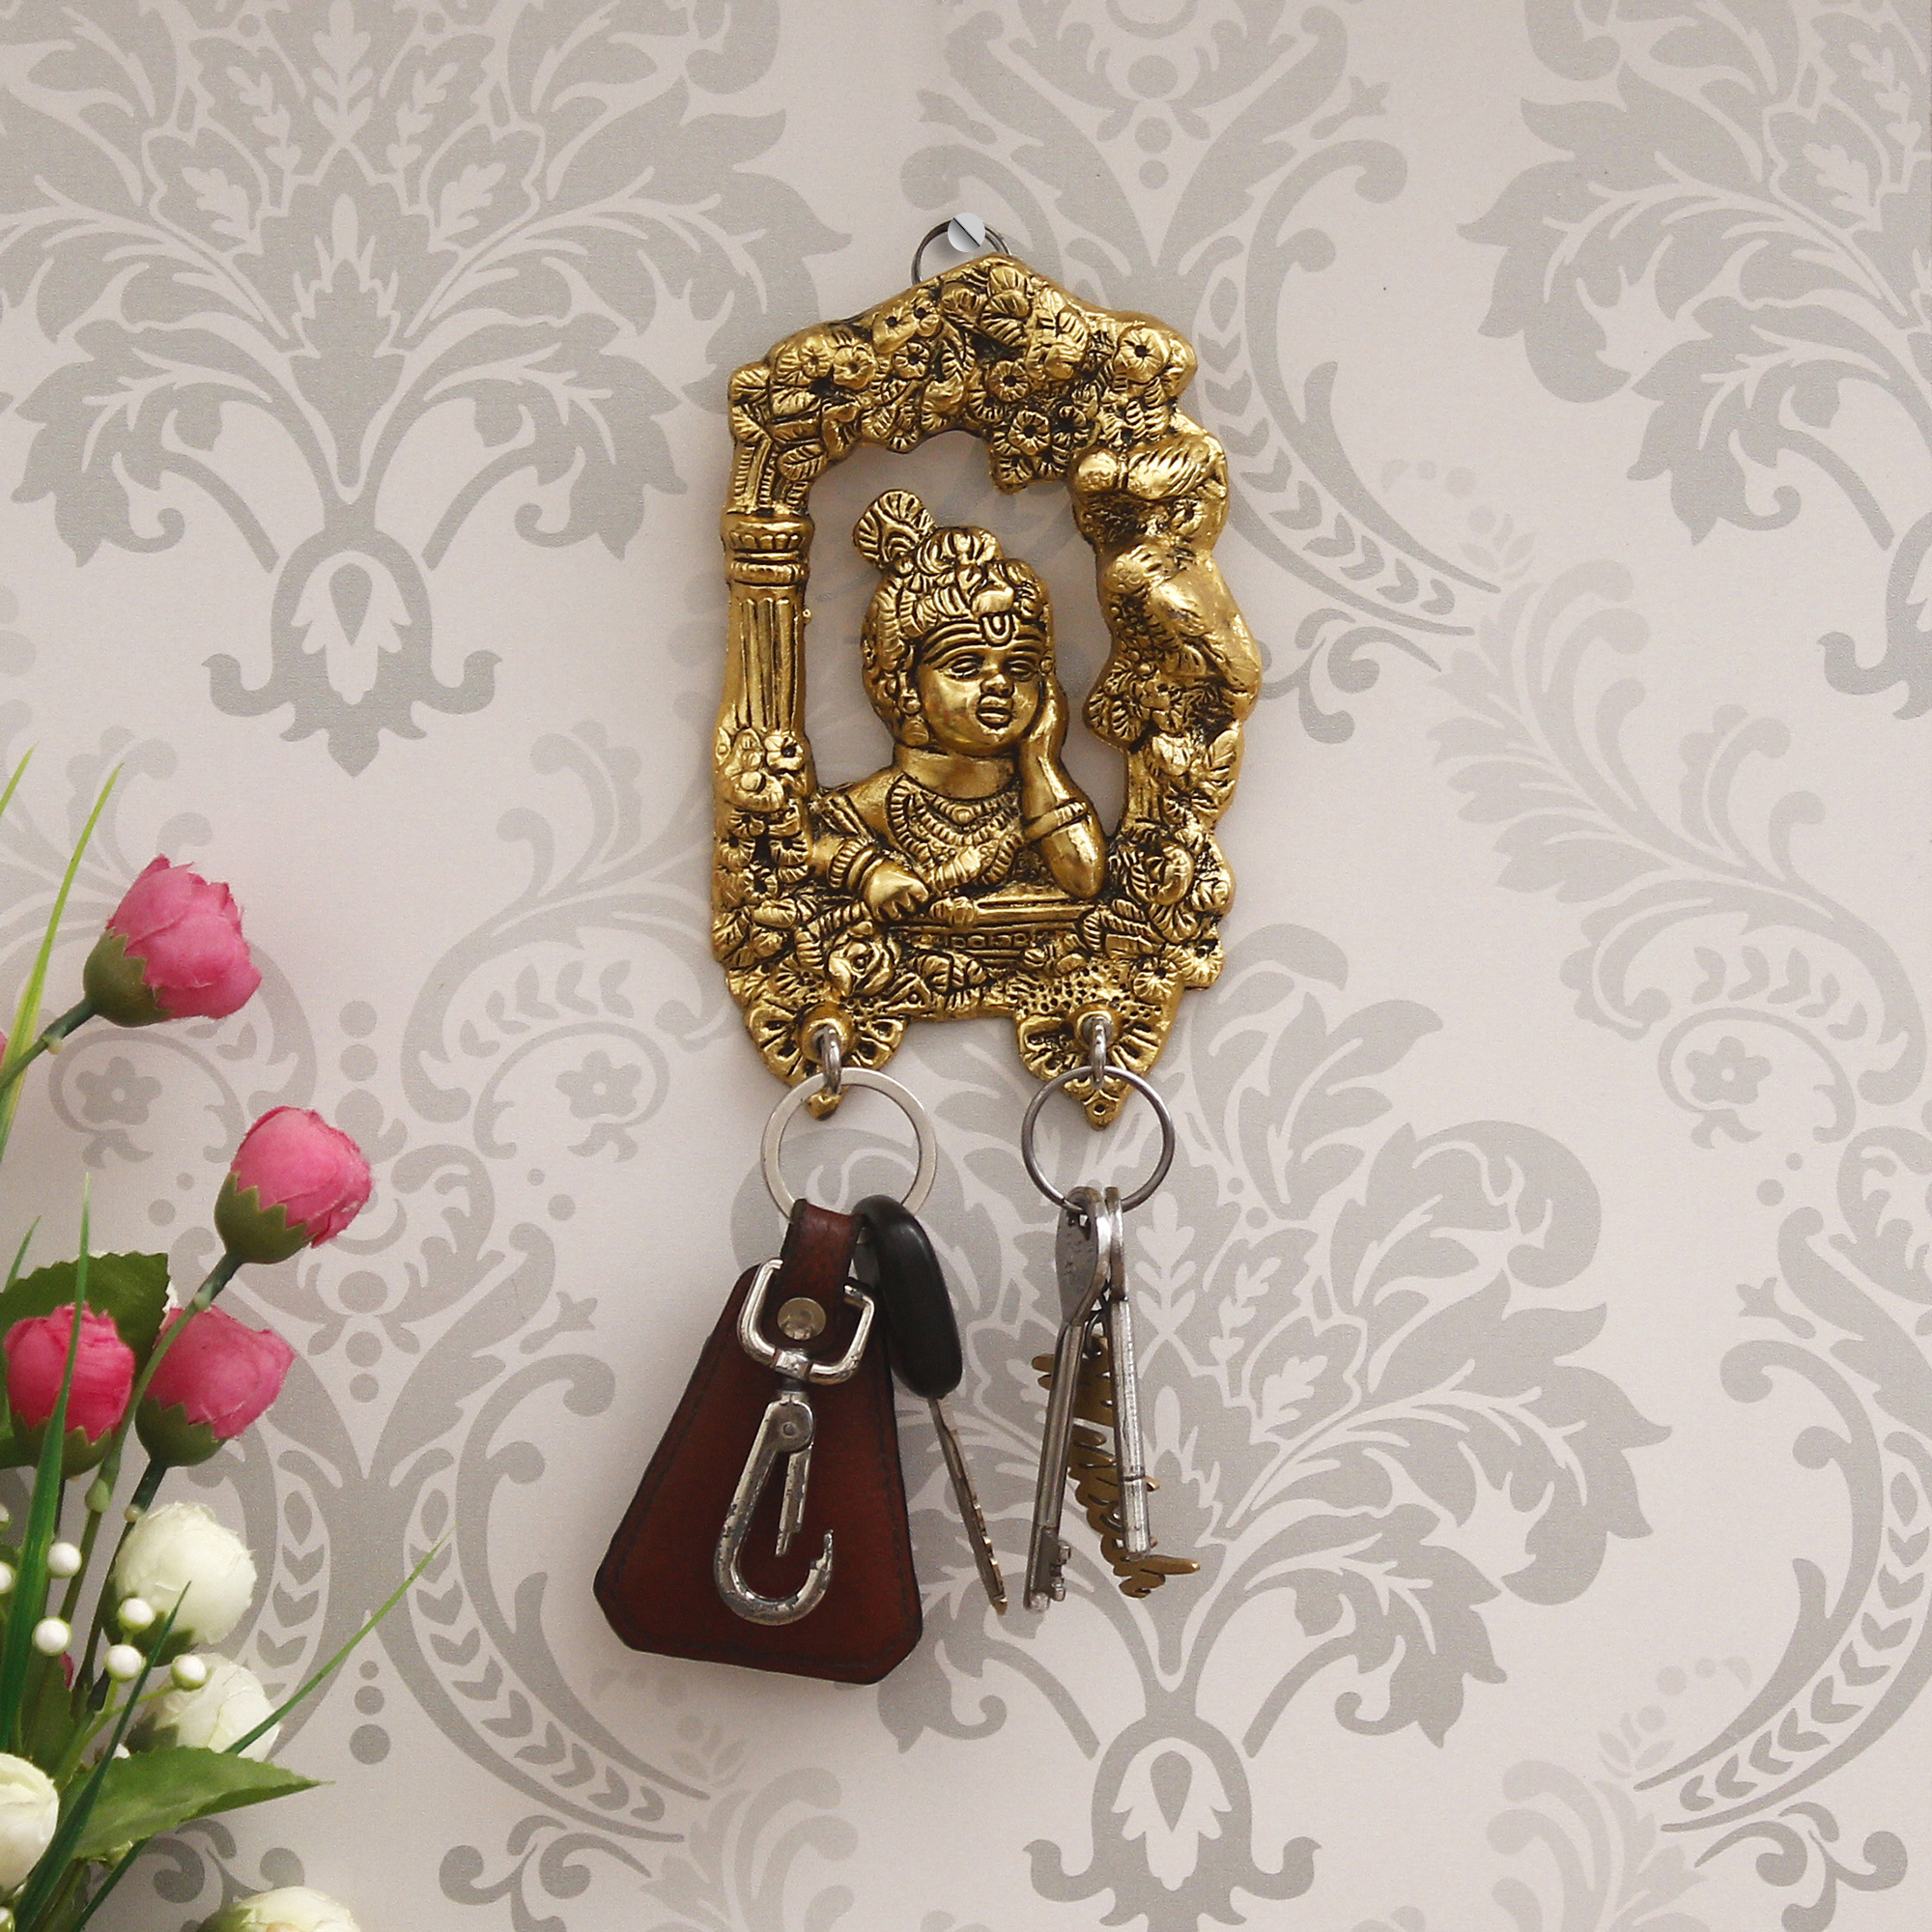 Golden Lord Krishna 2 Hooks Key Holder Indian Home Decor